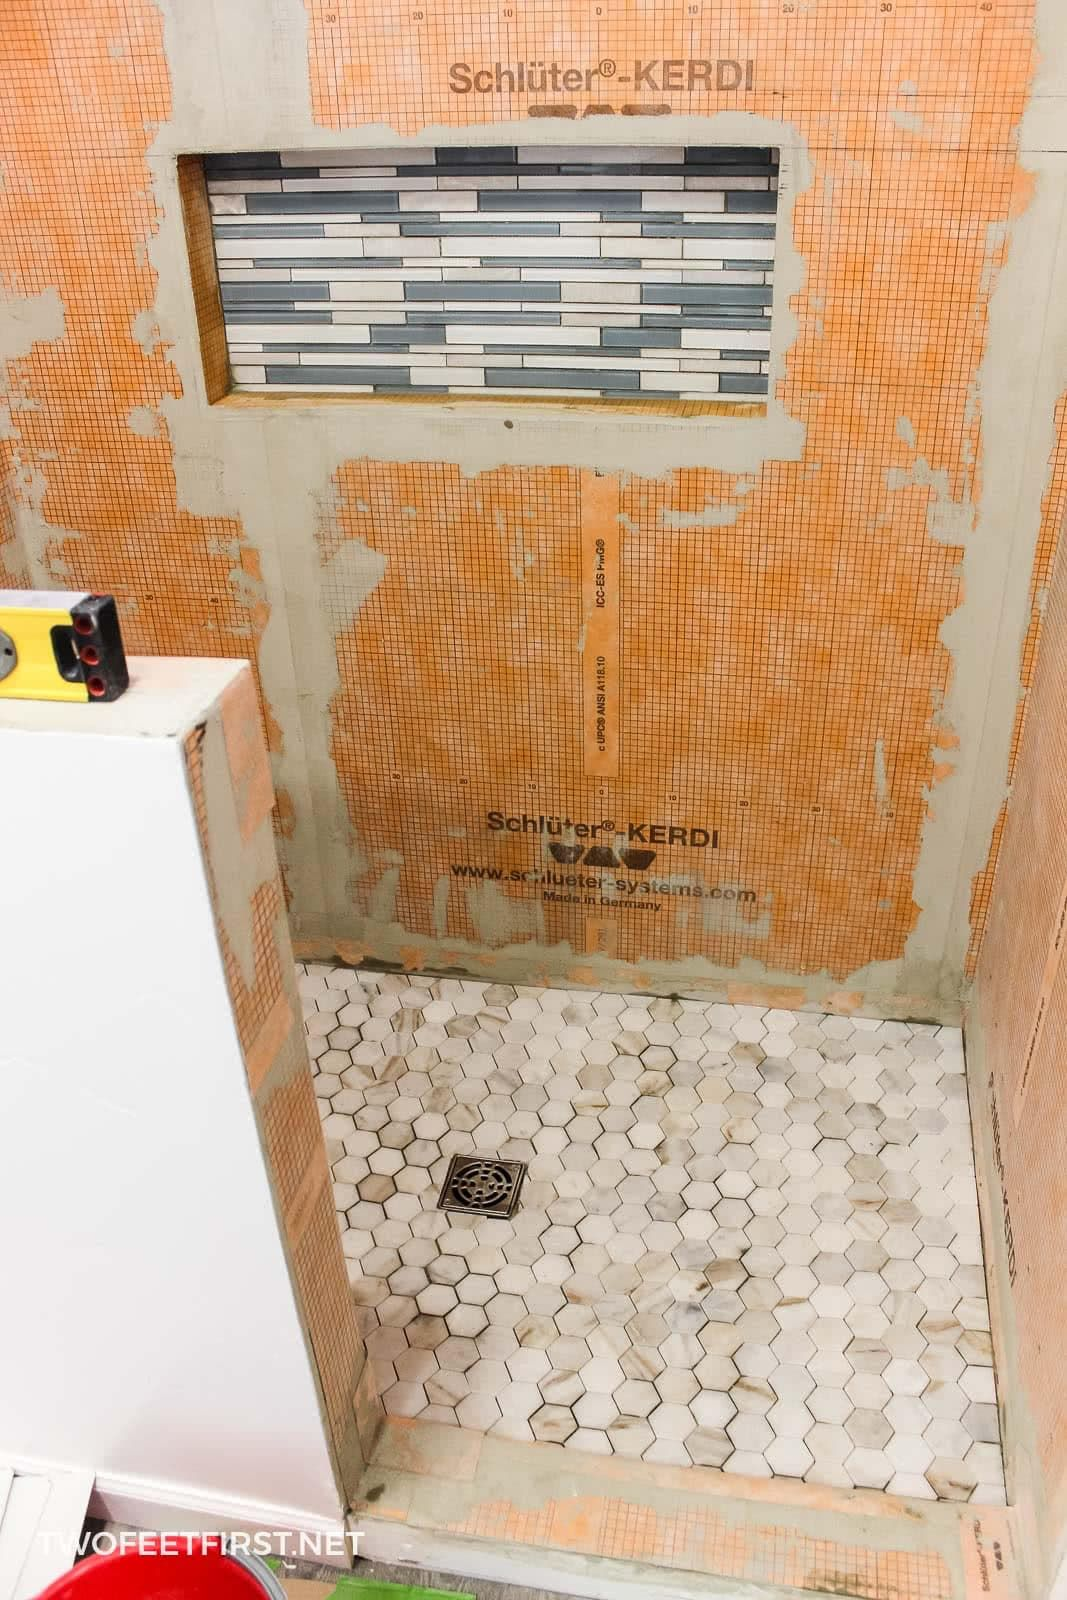 My Experience Tiling A Shower For The First Time Bathroom Flooring Bathroom Floor Tiles Diy Tile Shower